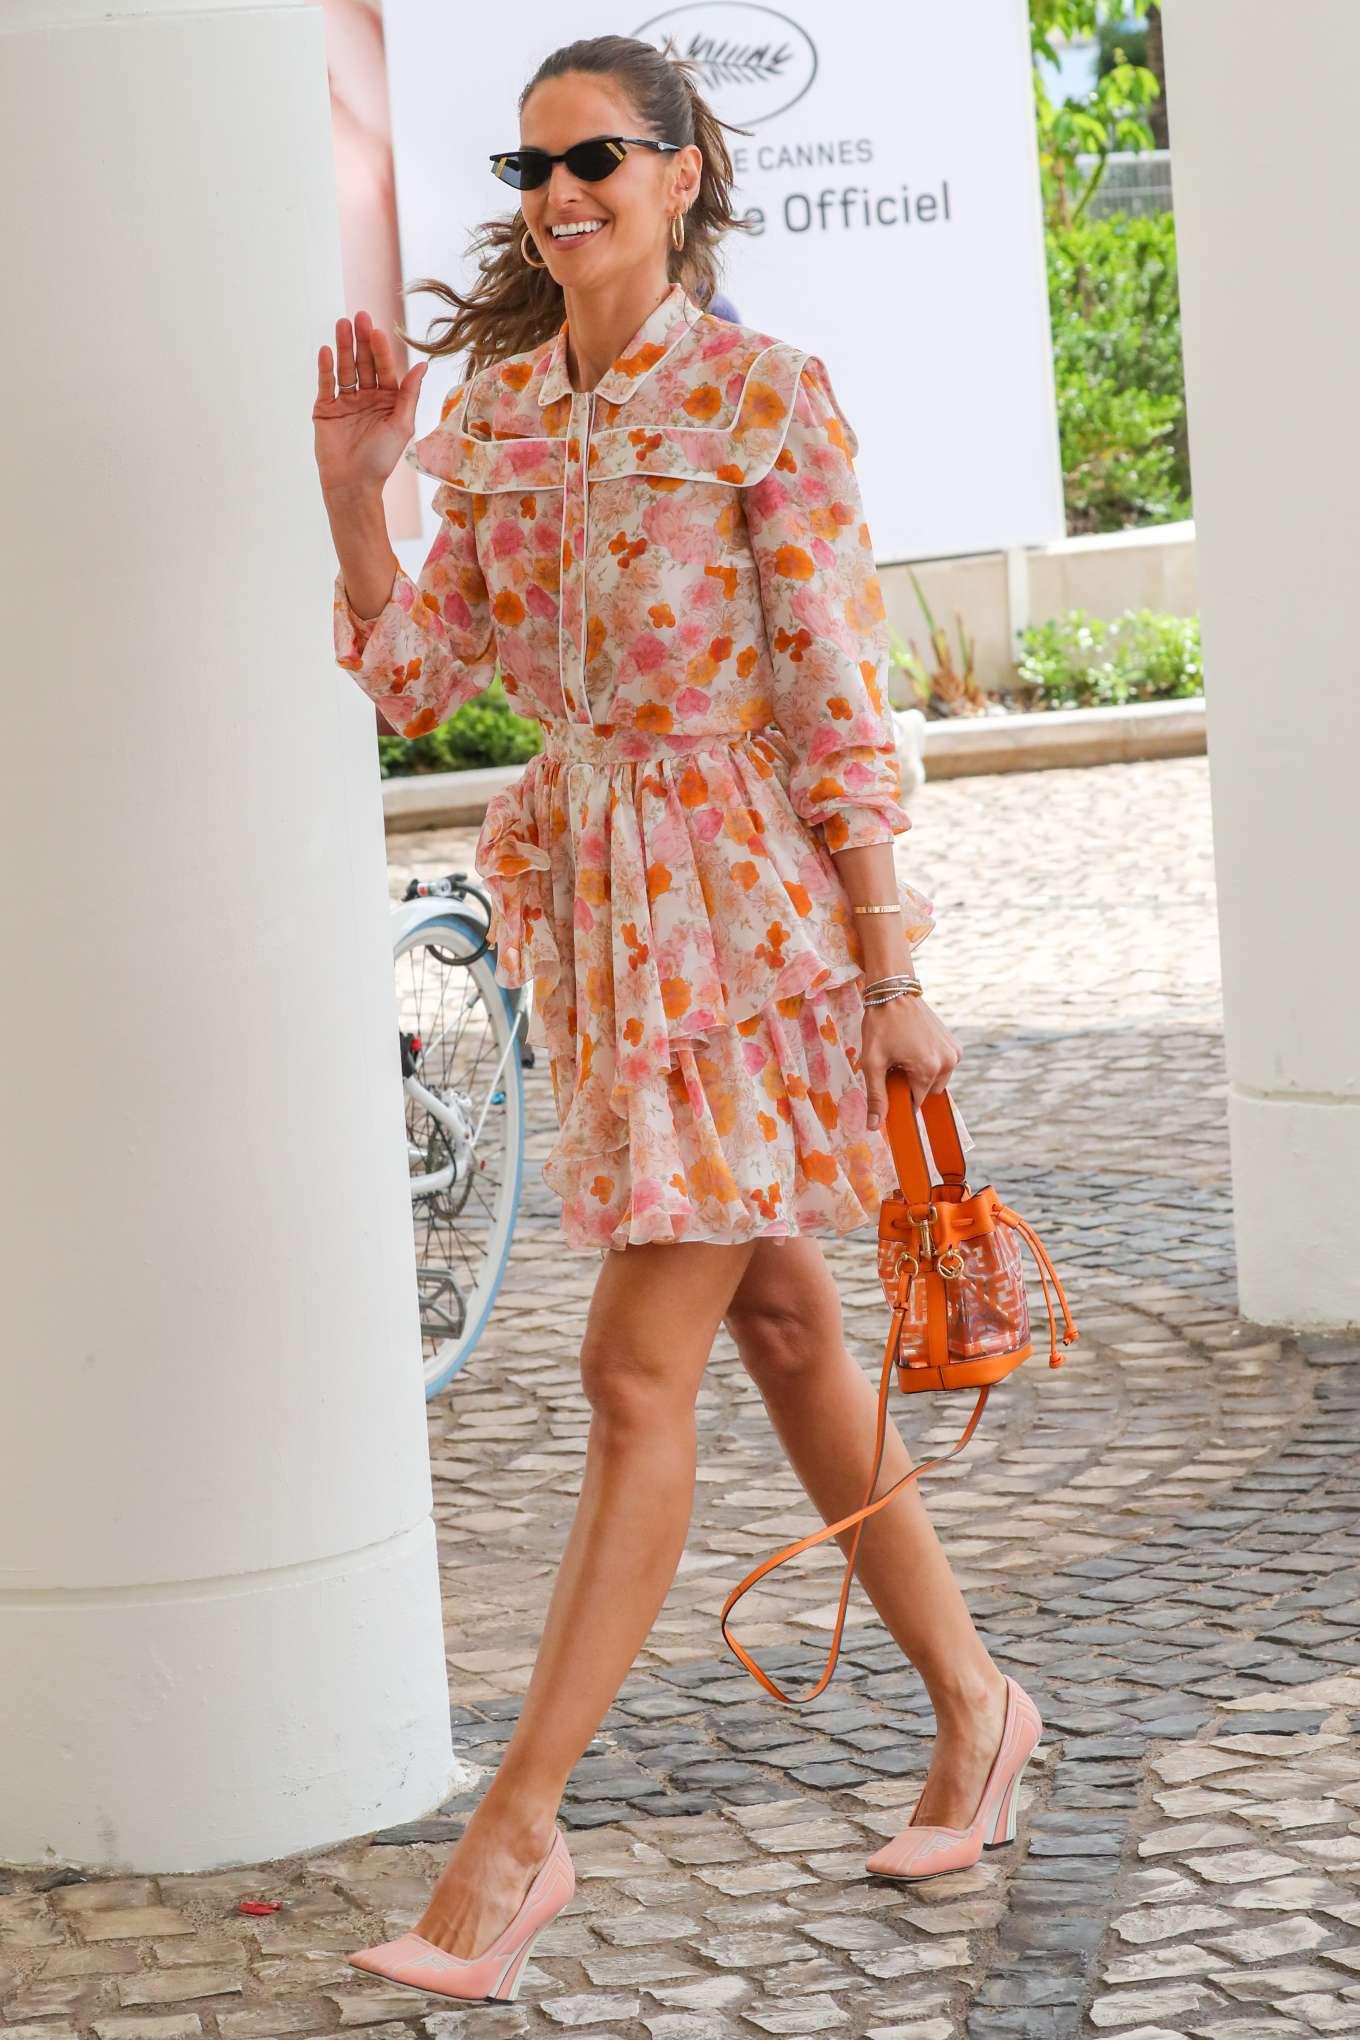 Izabel Goulart 2019 : Izabel Goulart in Floral Print Dress at the Martinez Hotel-23